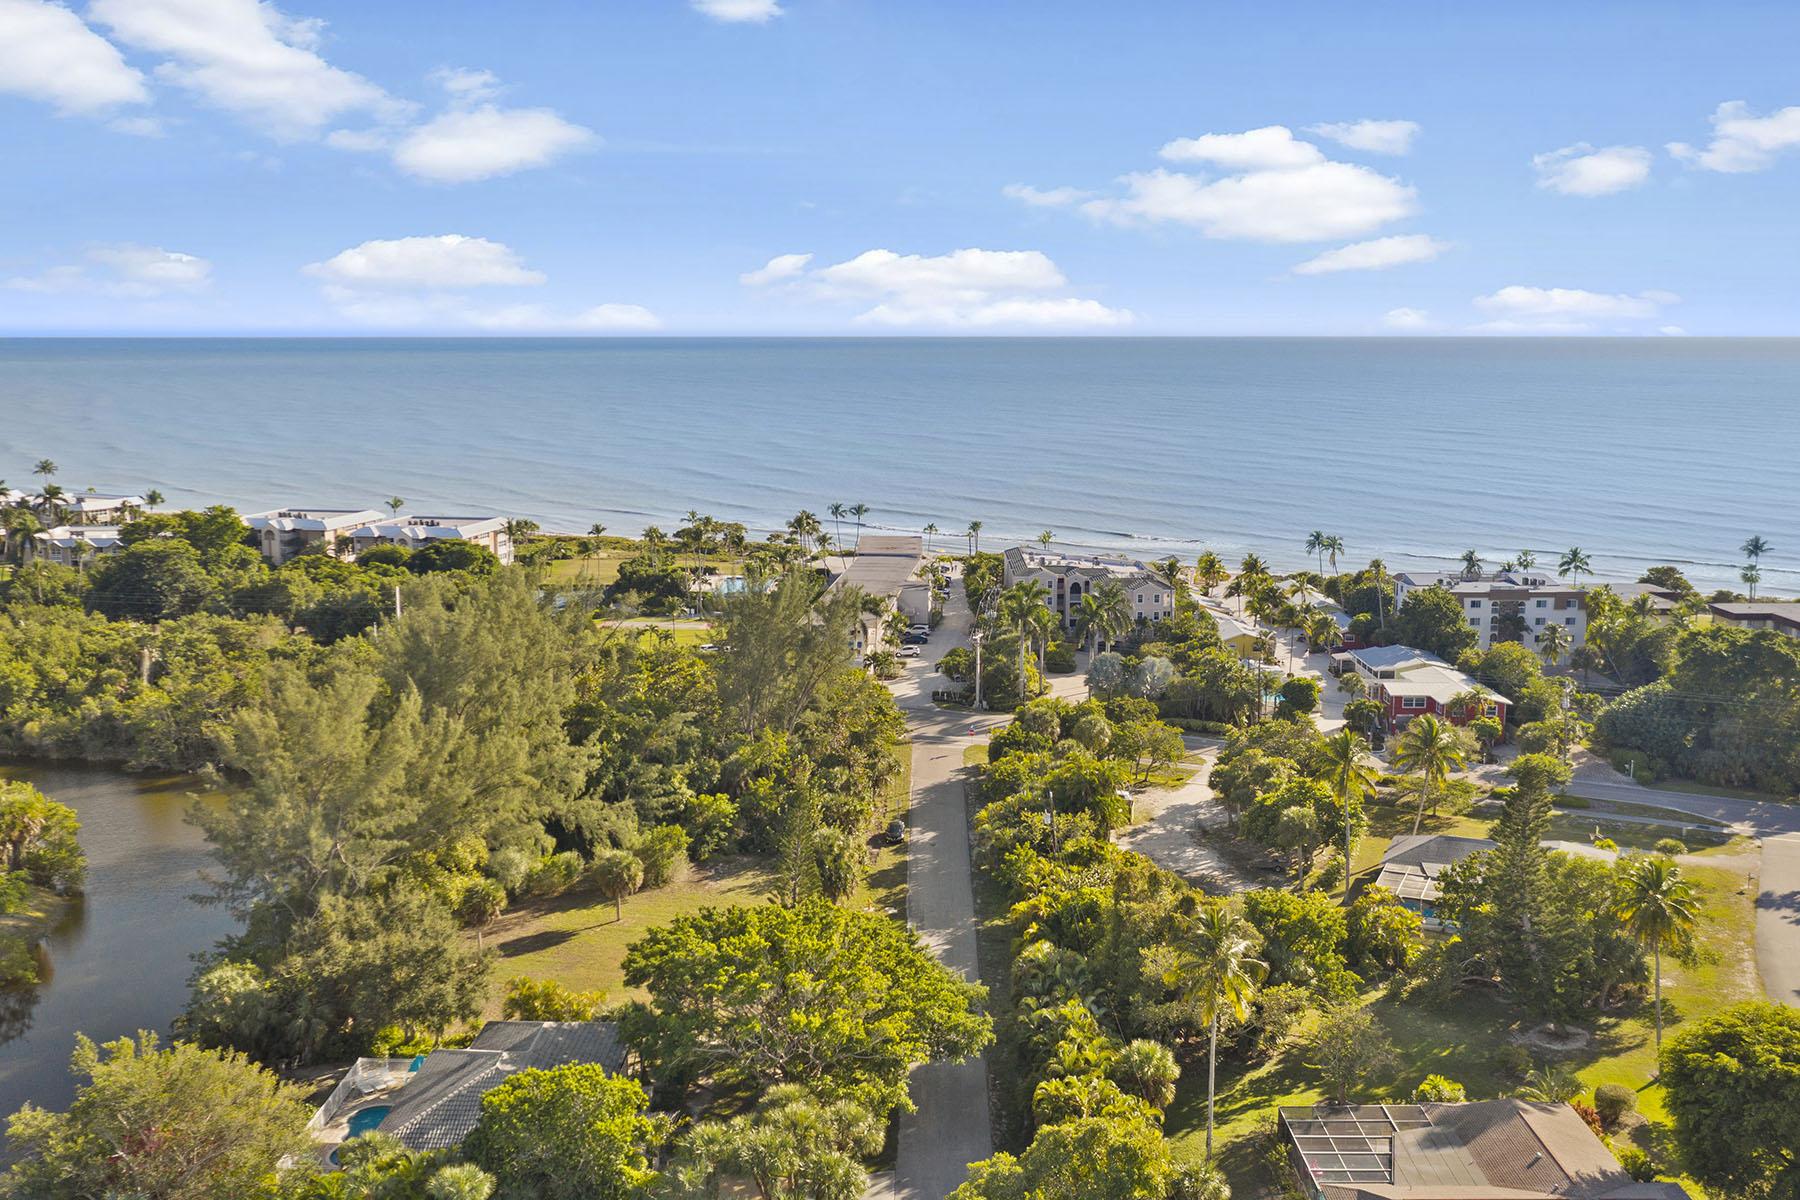 Land for Sale at SANIBEL-BRIGHT WATER 3308 Saint Kilda Road, Sanibel, Florida 33957 United States